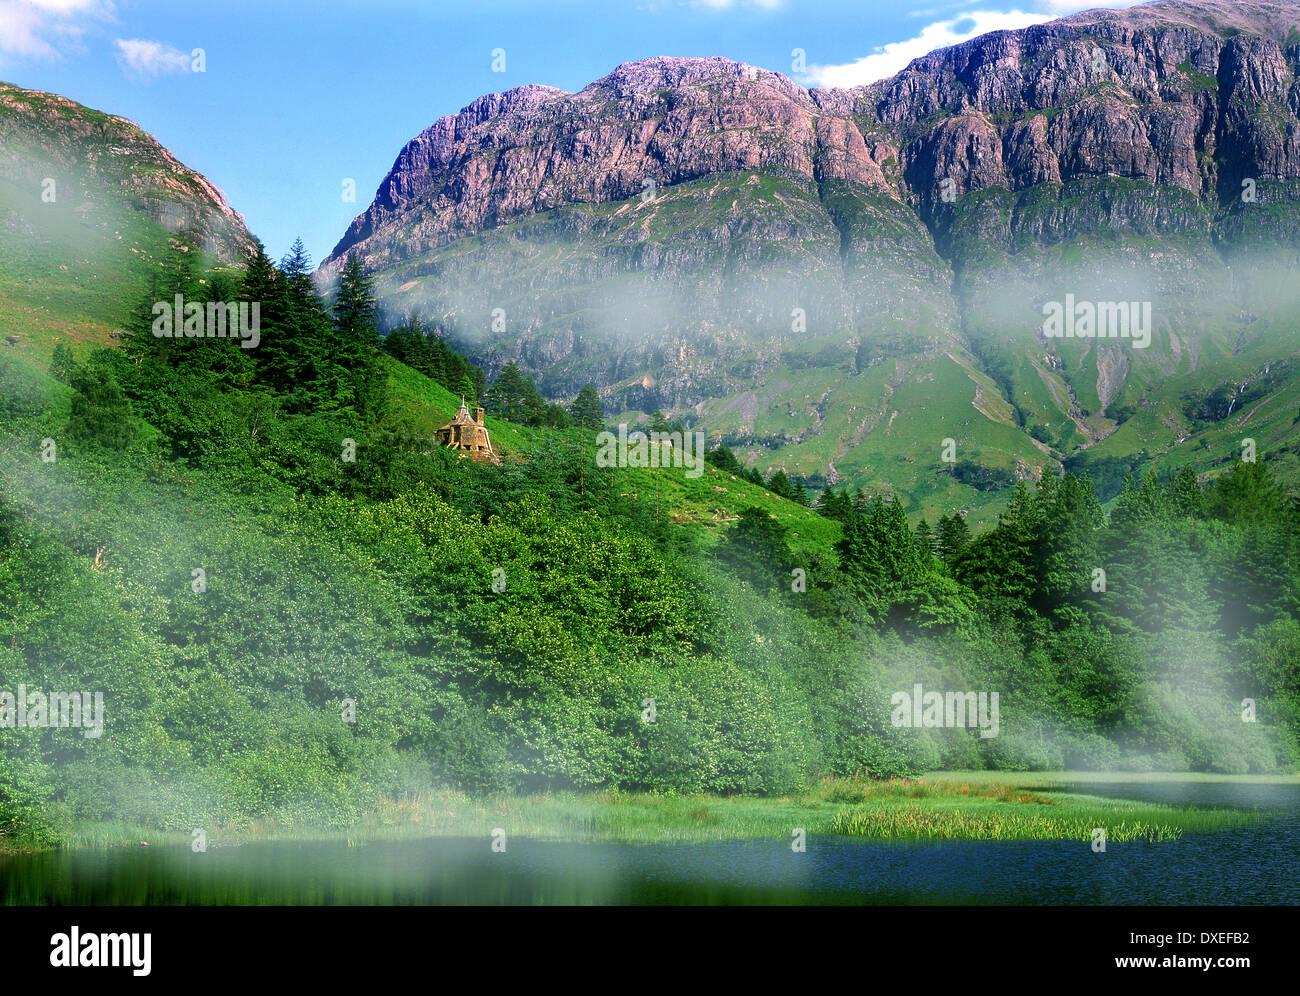 Hagrids hut on the set of Harry Potter, Glencoe, West Highlands - Stock Image